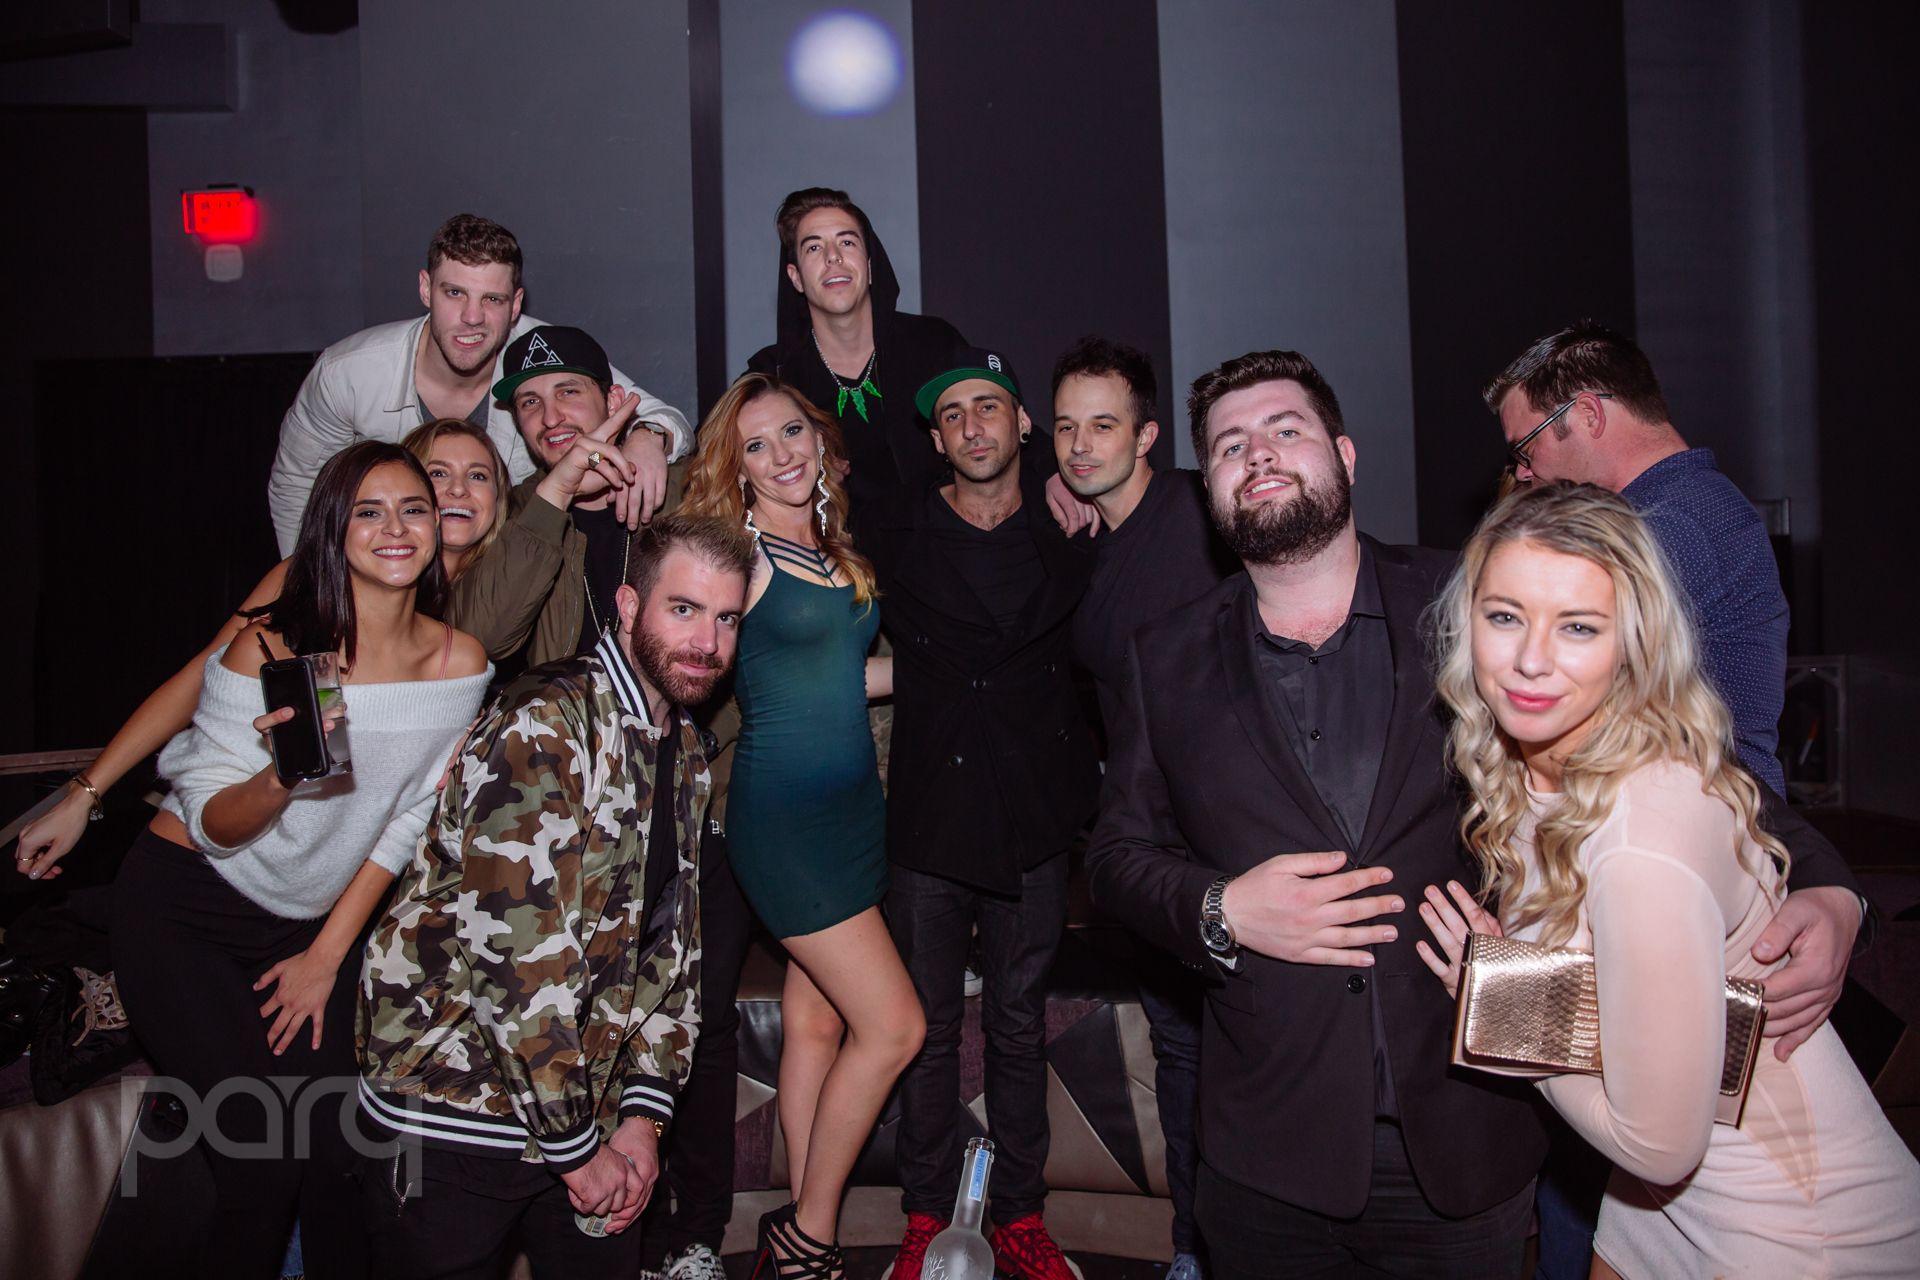 01.19.18 Parq - DJ Hollywood-25.jpg